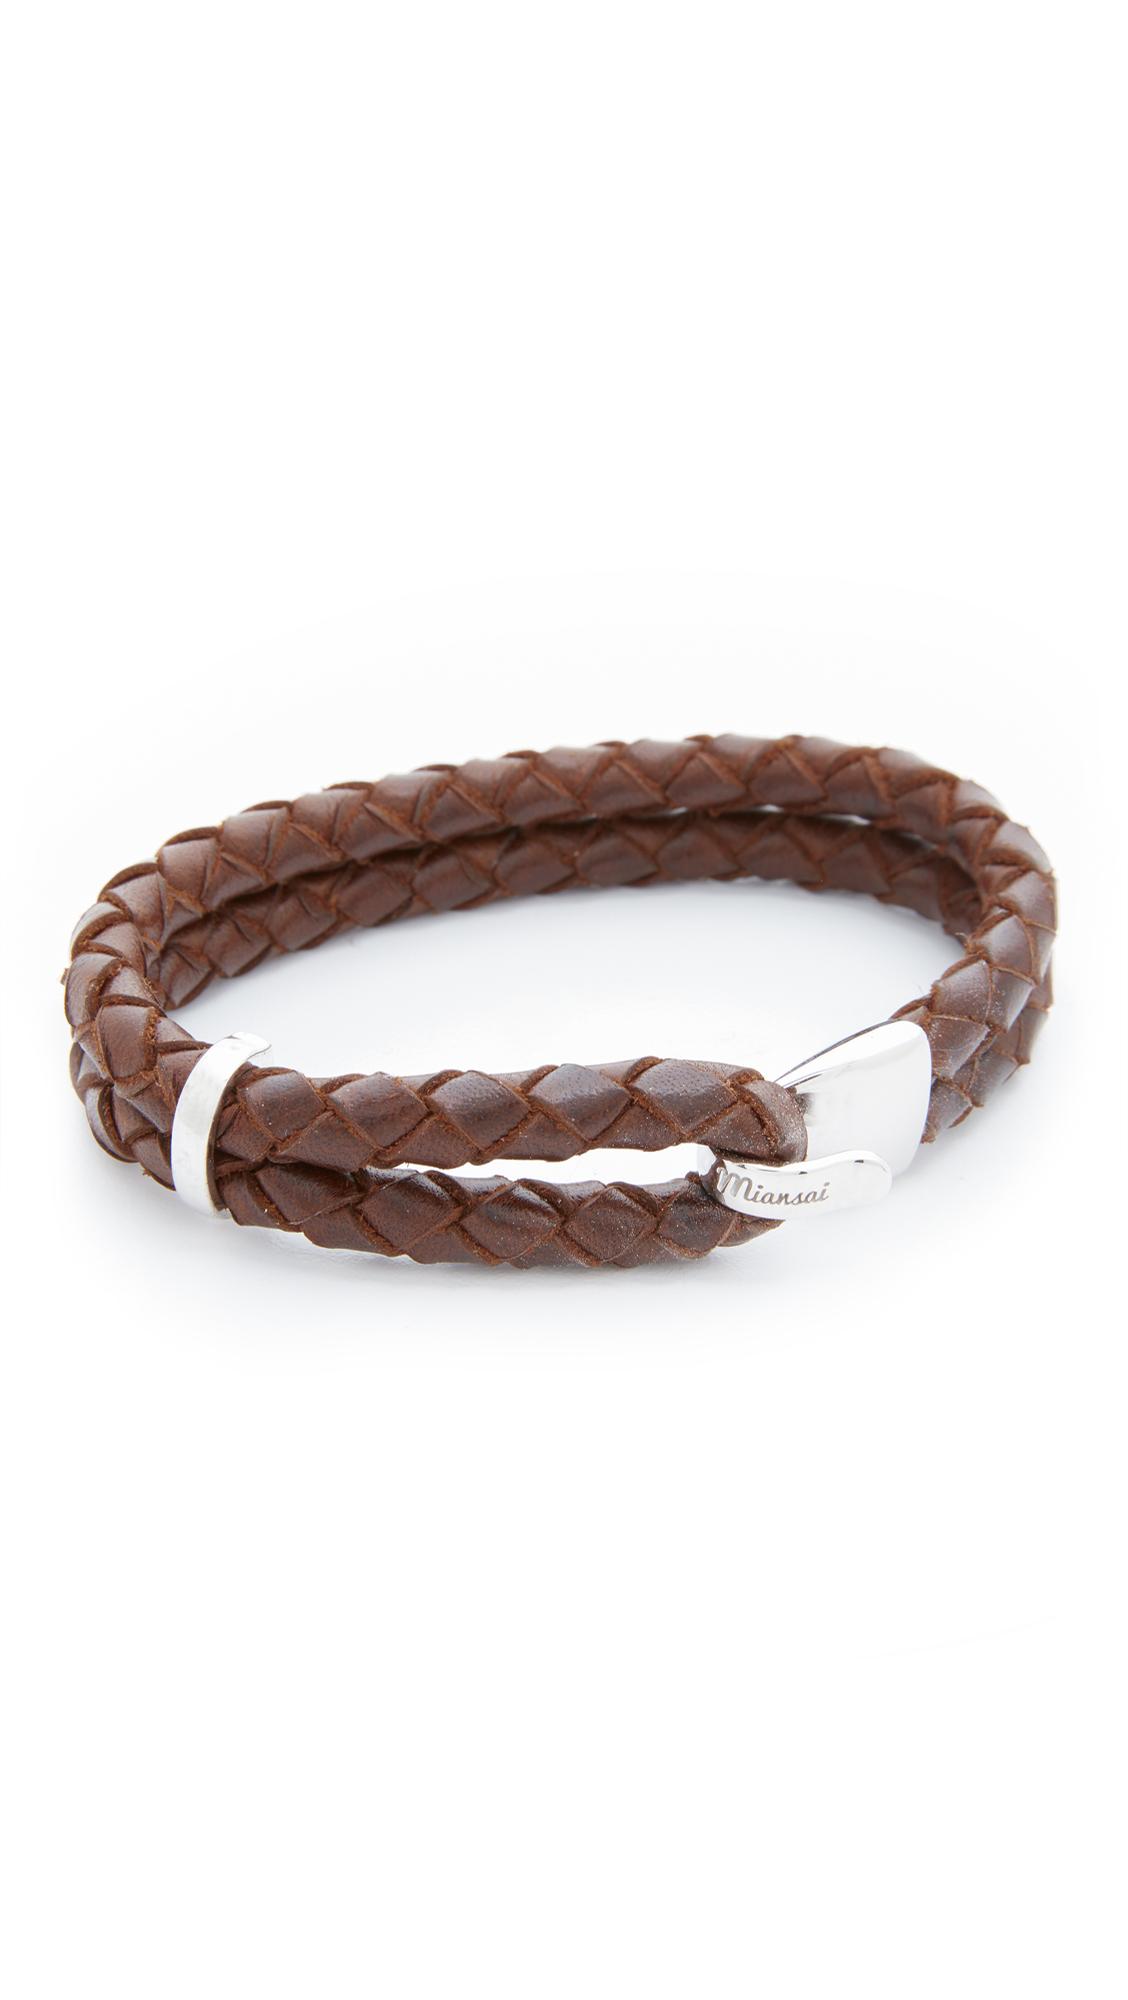 Miansai Beacon Leather Bracelet - Silver/Brown bPvcTX